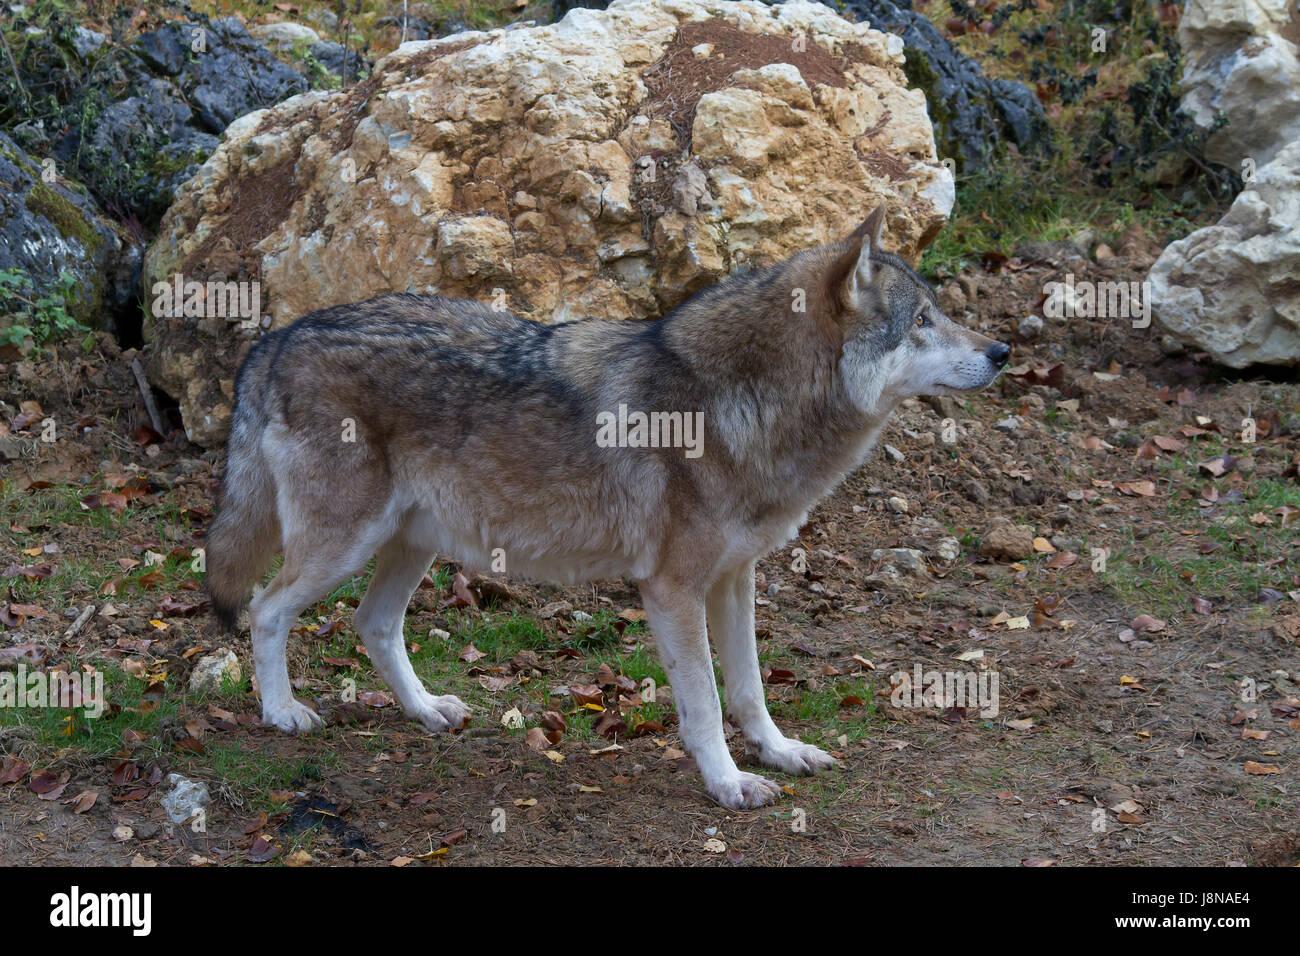 wild, portrait, eyes, zoo, dog, nature, head, fall, autumn, wild, face, Stock Photo